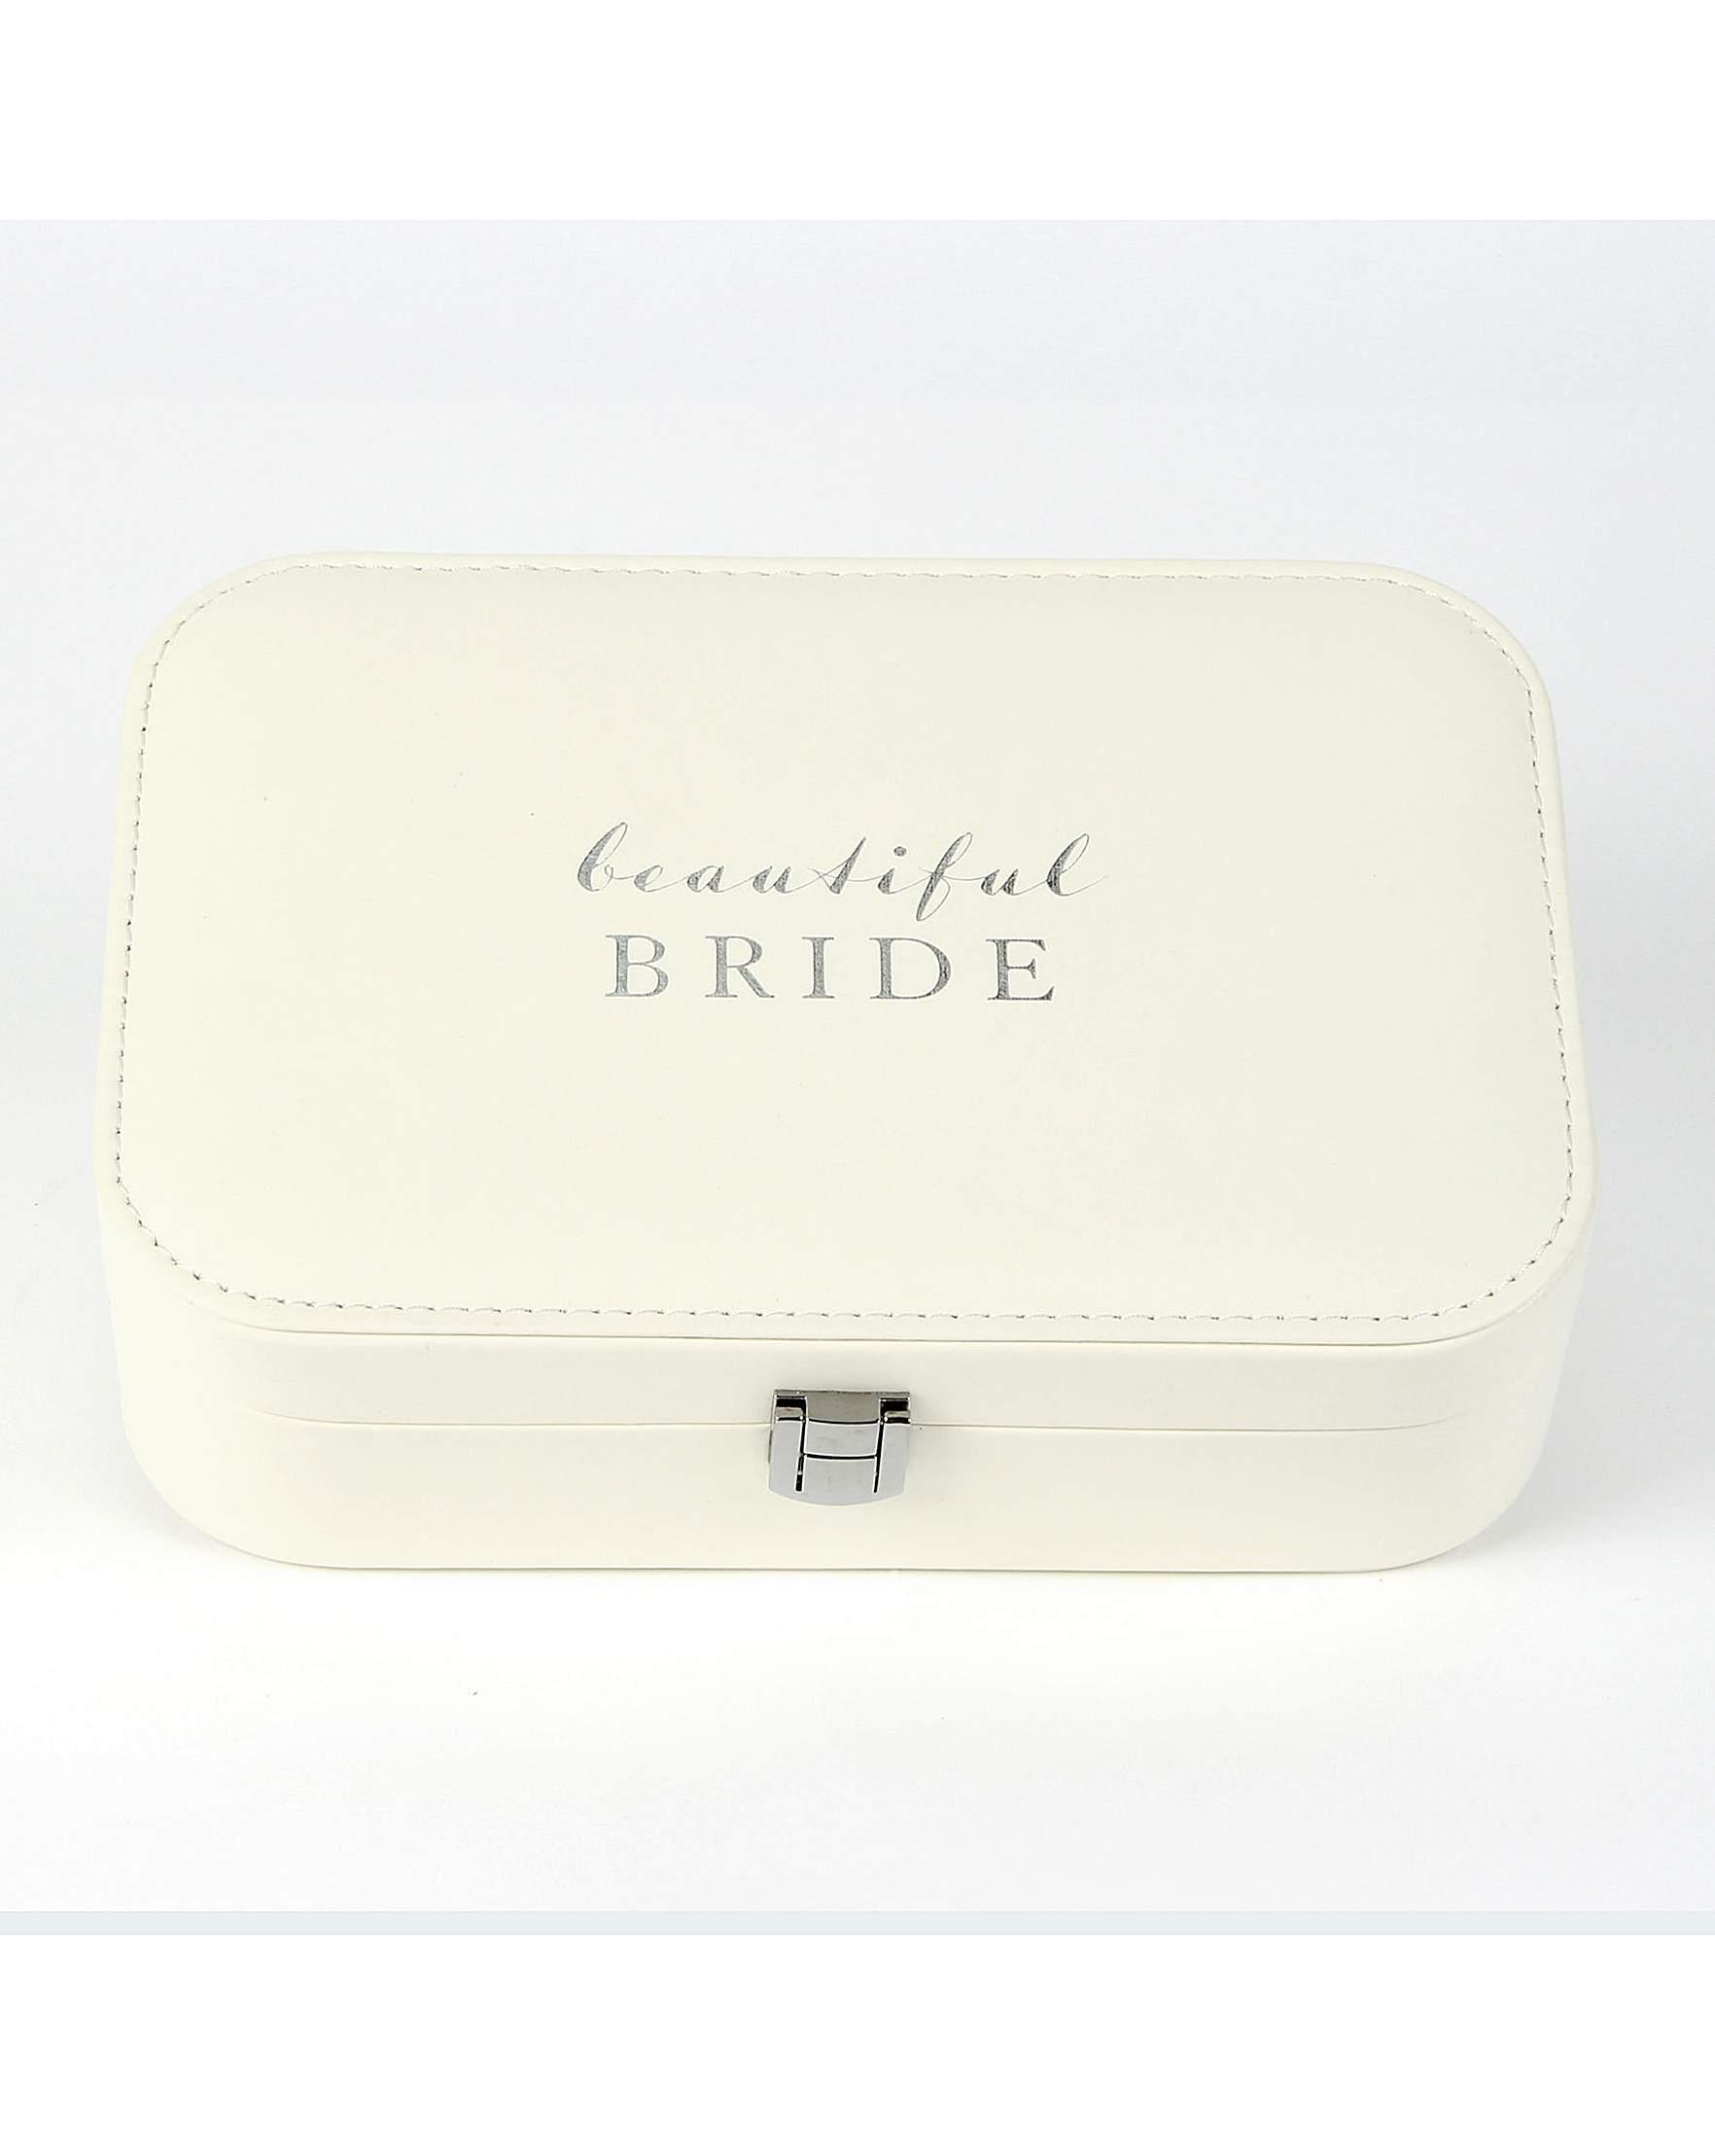 Beautiful Bride Jewellery Box for sale